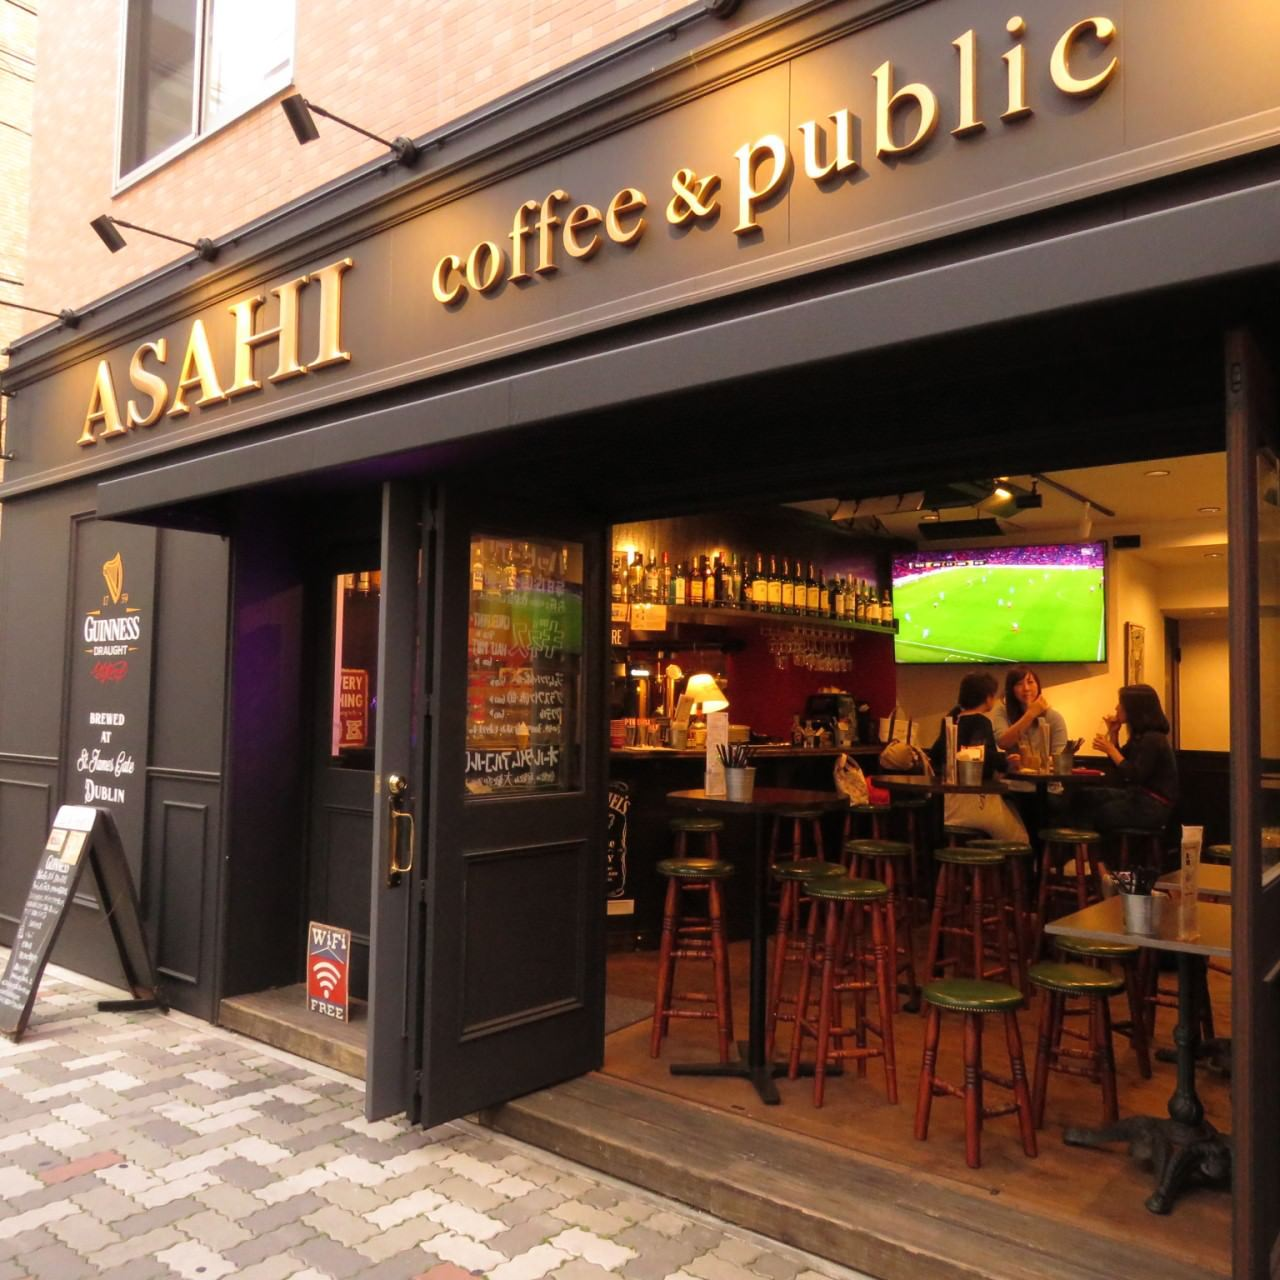 ASAHI (アサヒ) coffee&public 静岡駅南